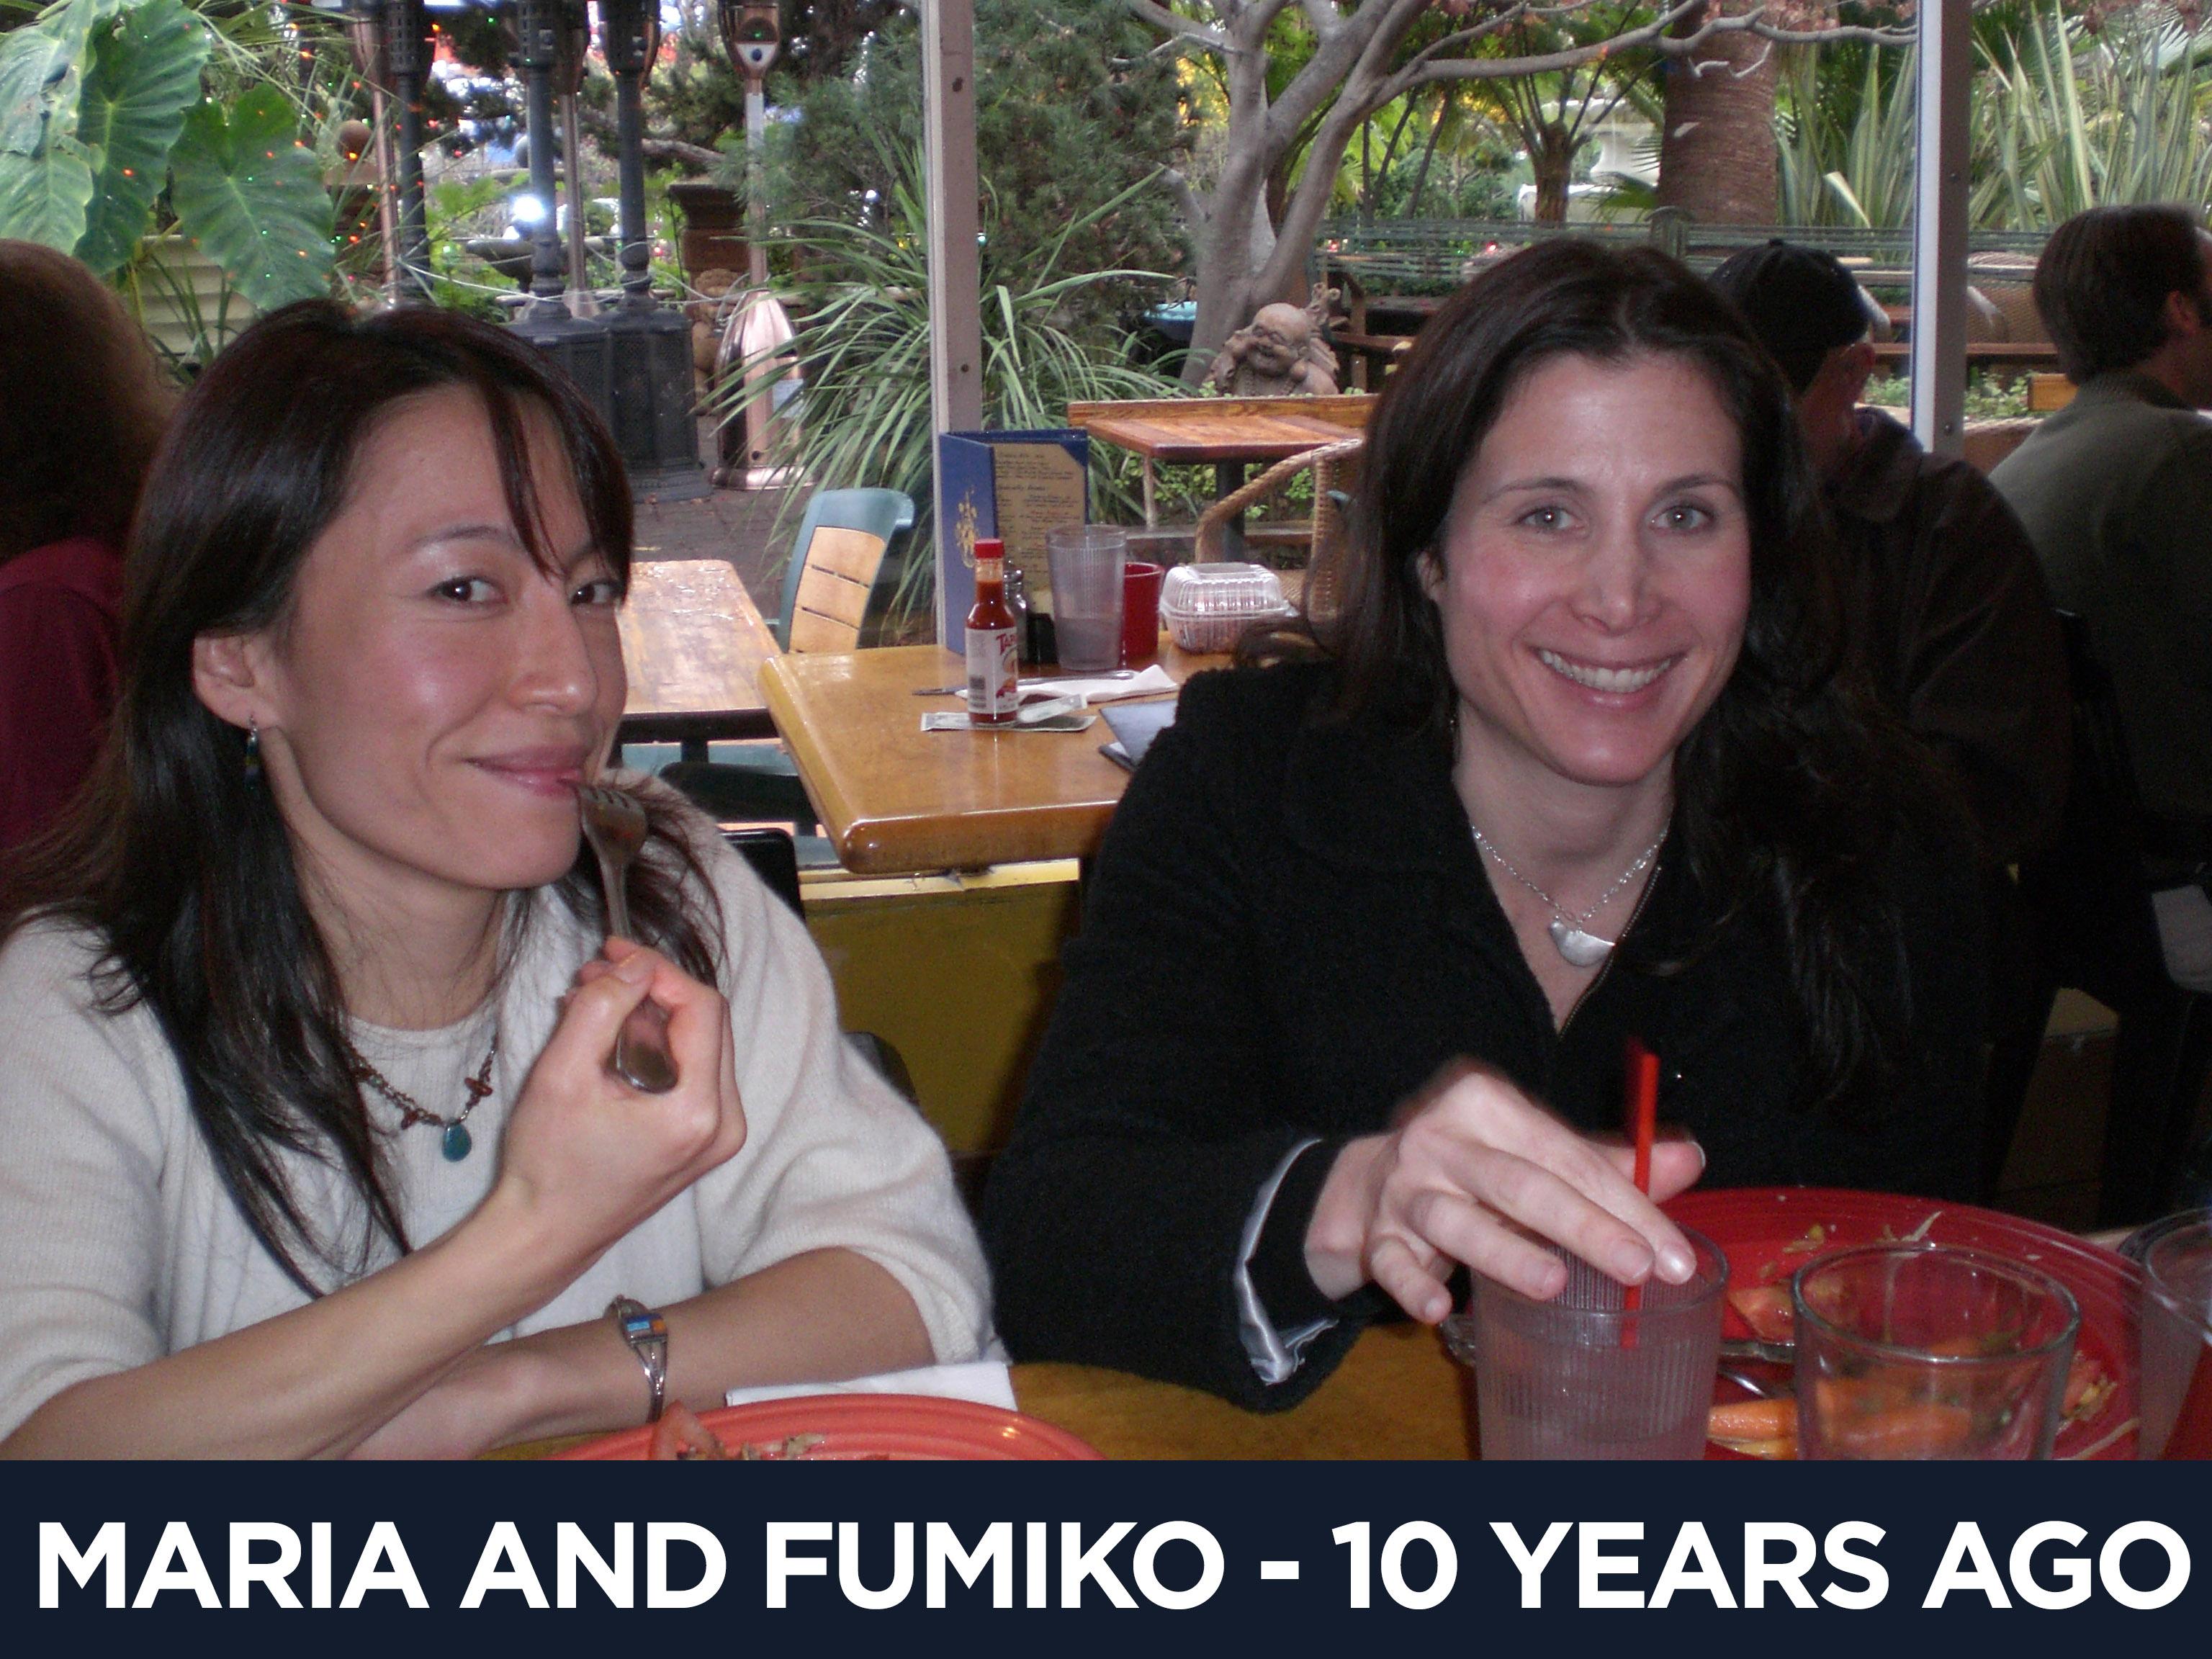 Maria and Fumiko 10 Years Ago